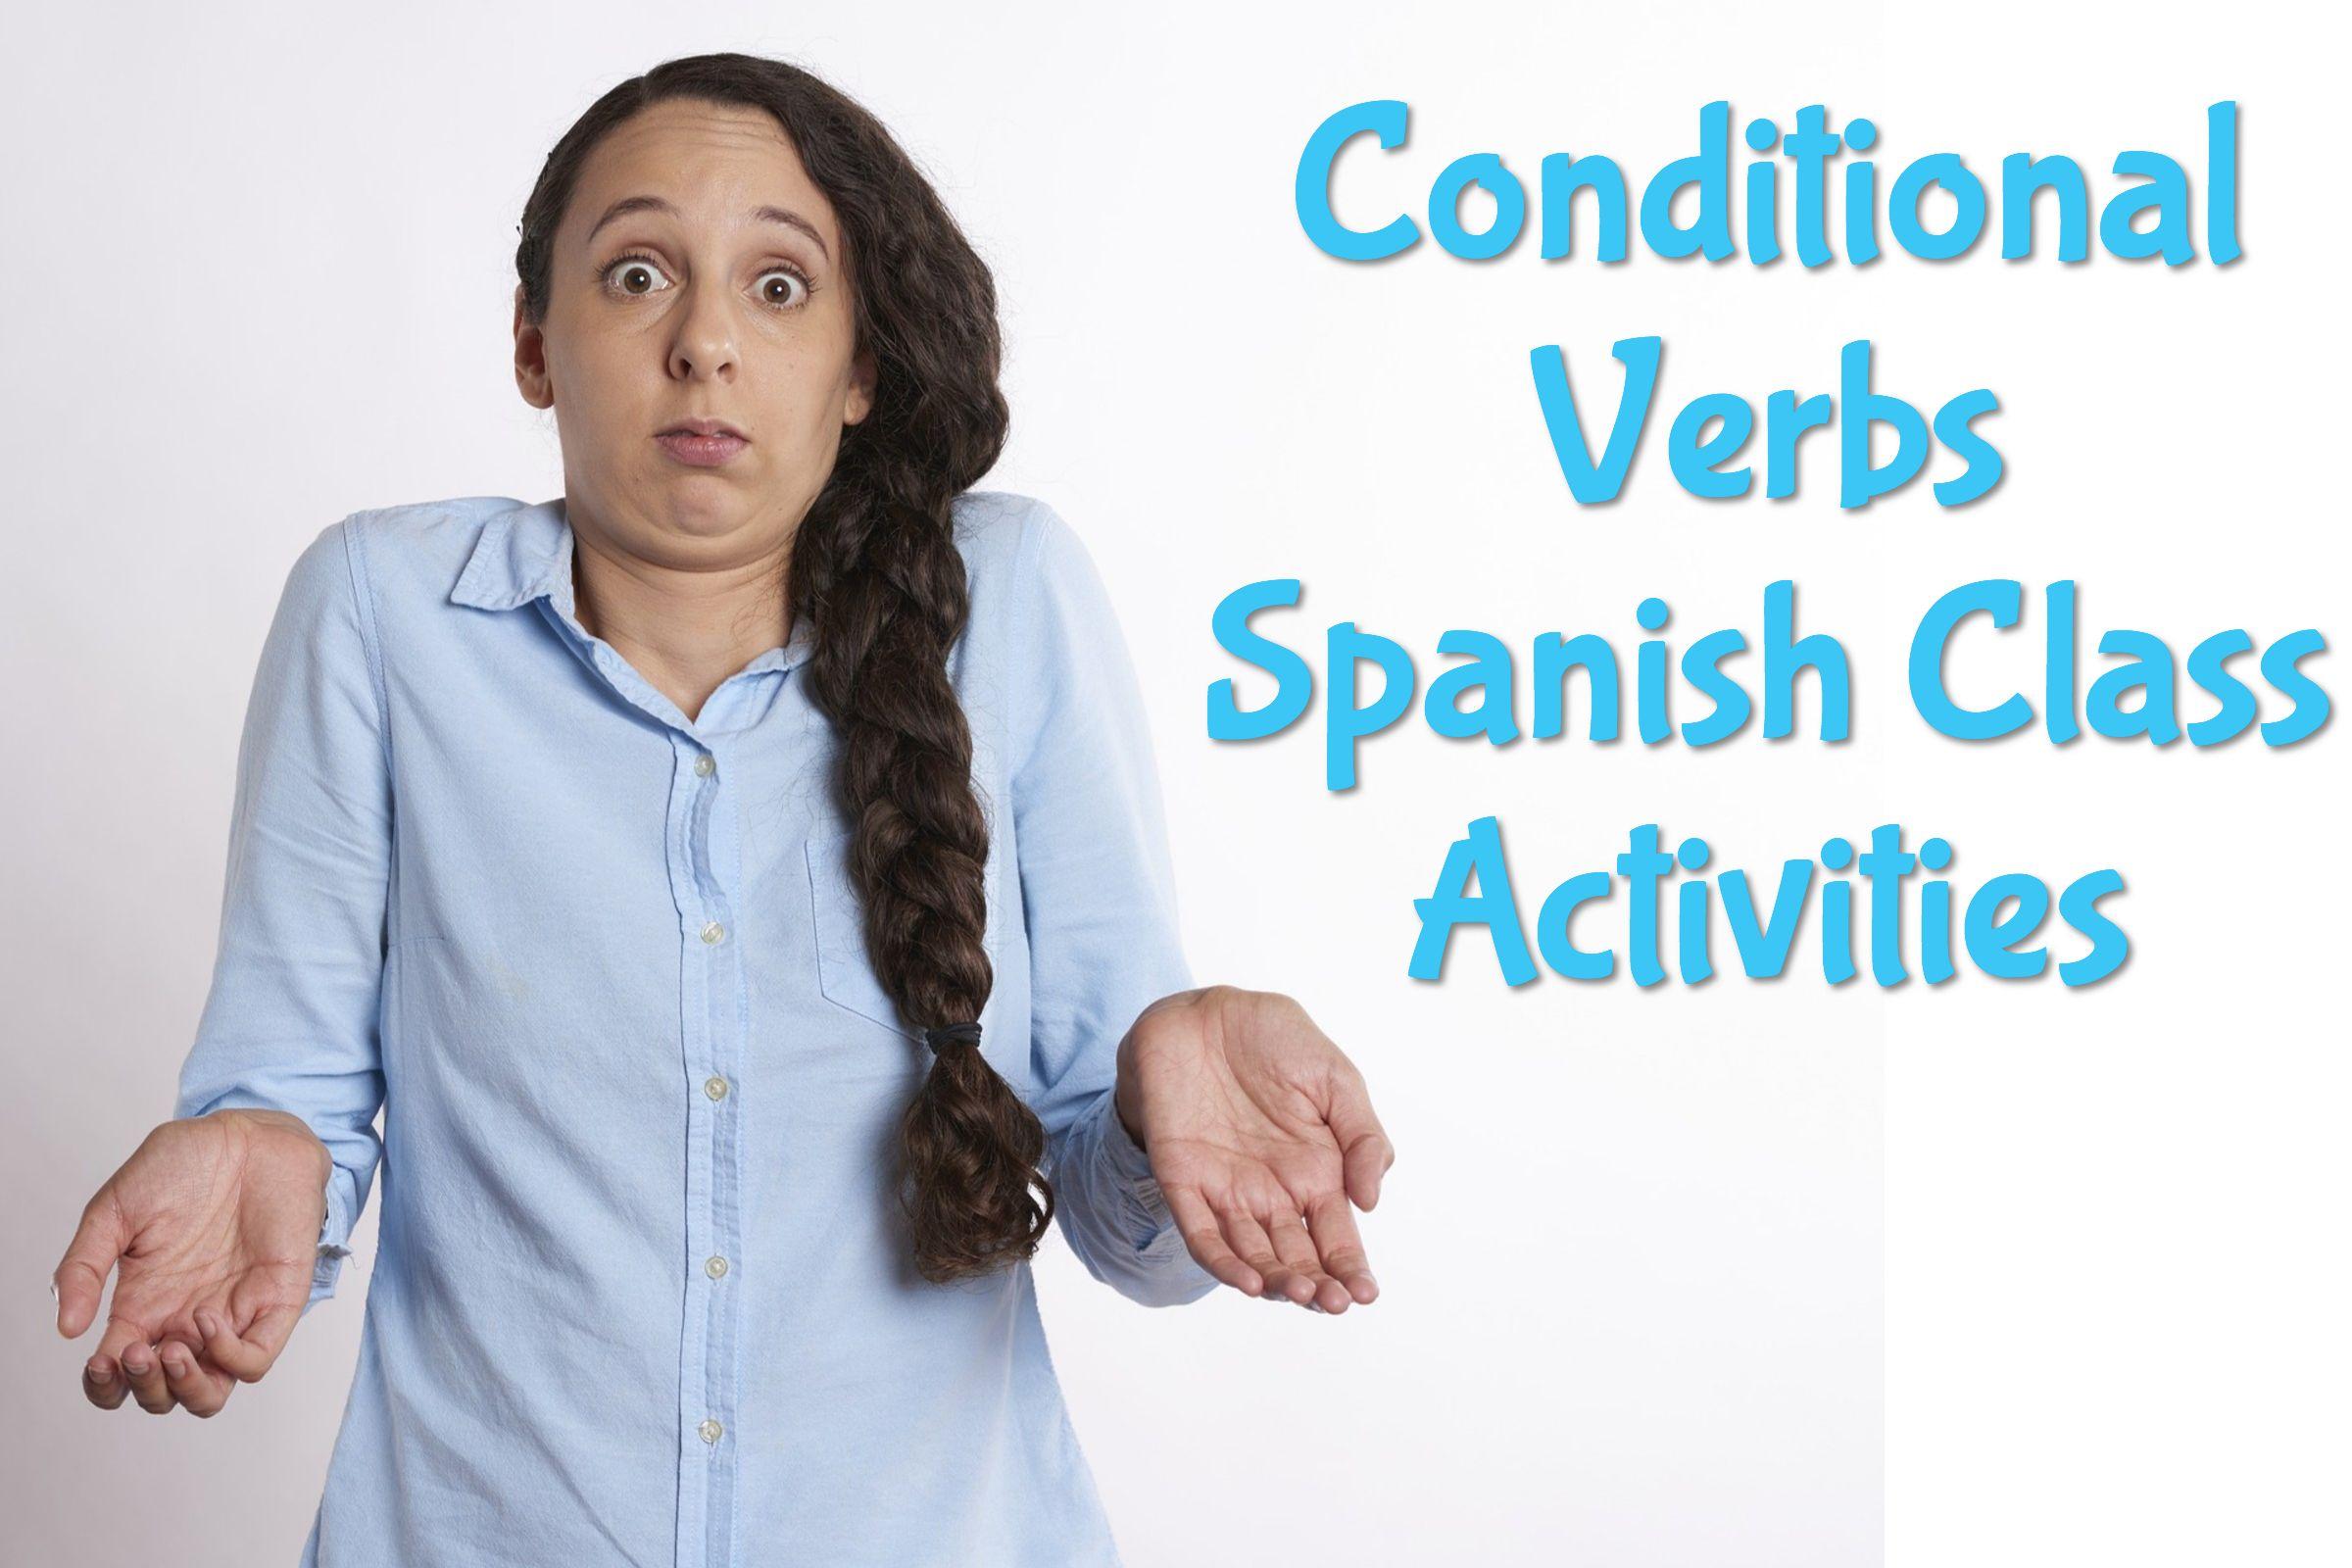 Conditional Verbs Spanish Class Activities